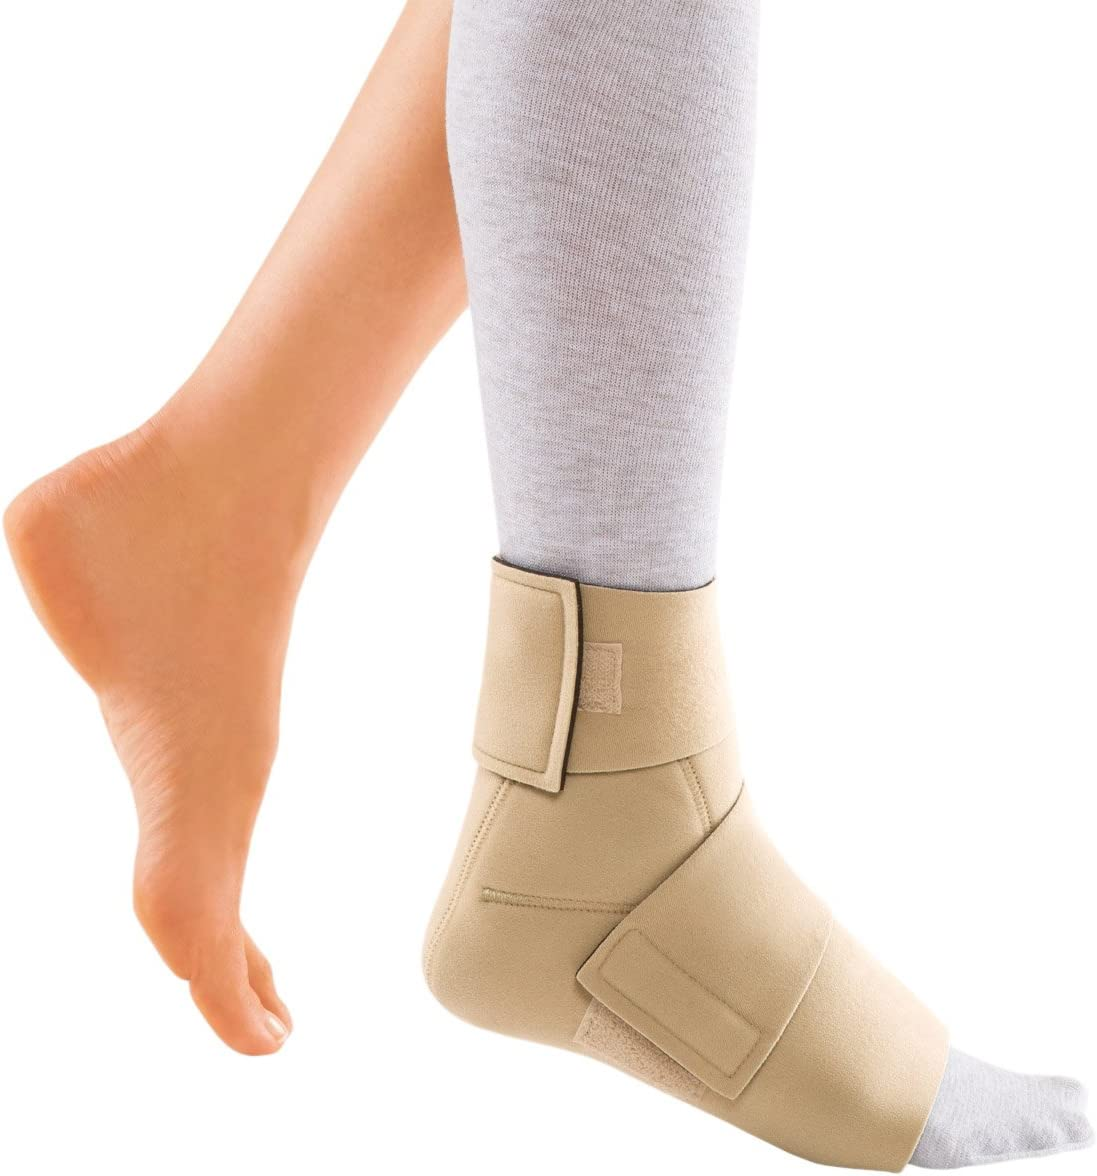 Max 71% OFF circaid Juxtafit Premium Interlocking Ankle Foot Excellence Wrap closed he